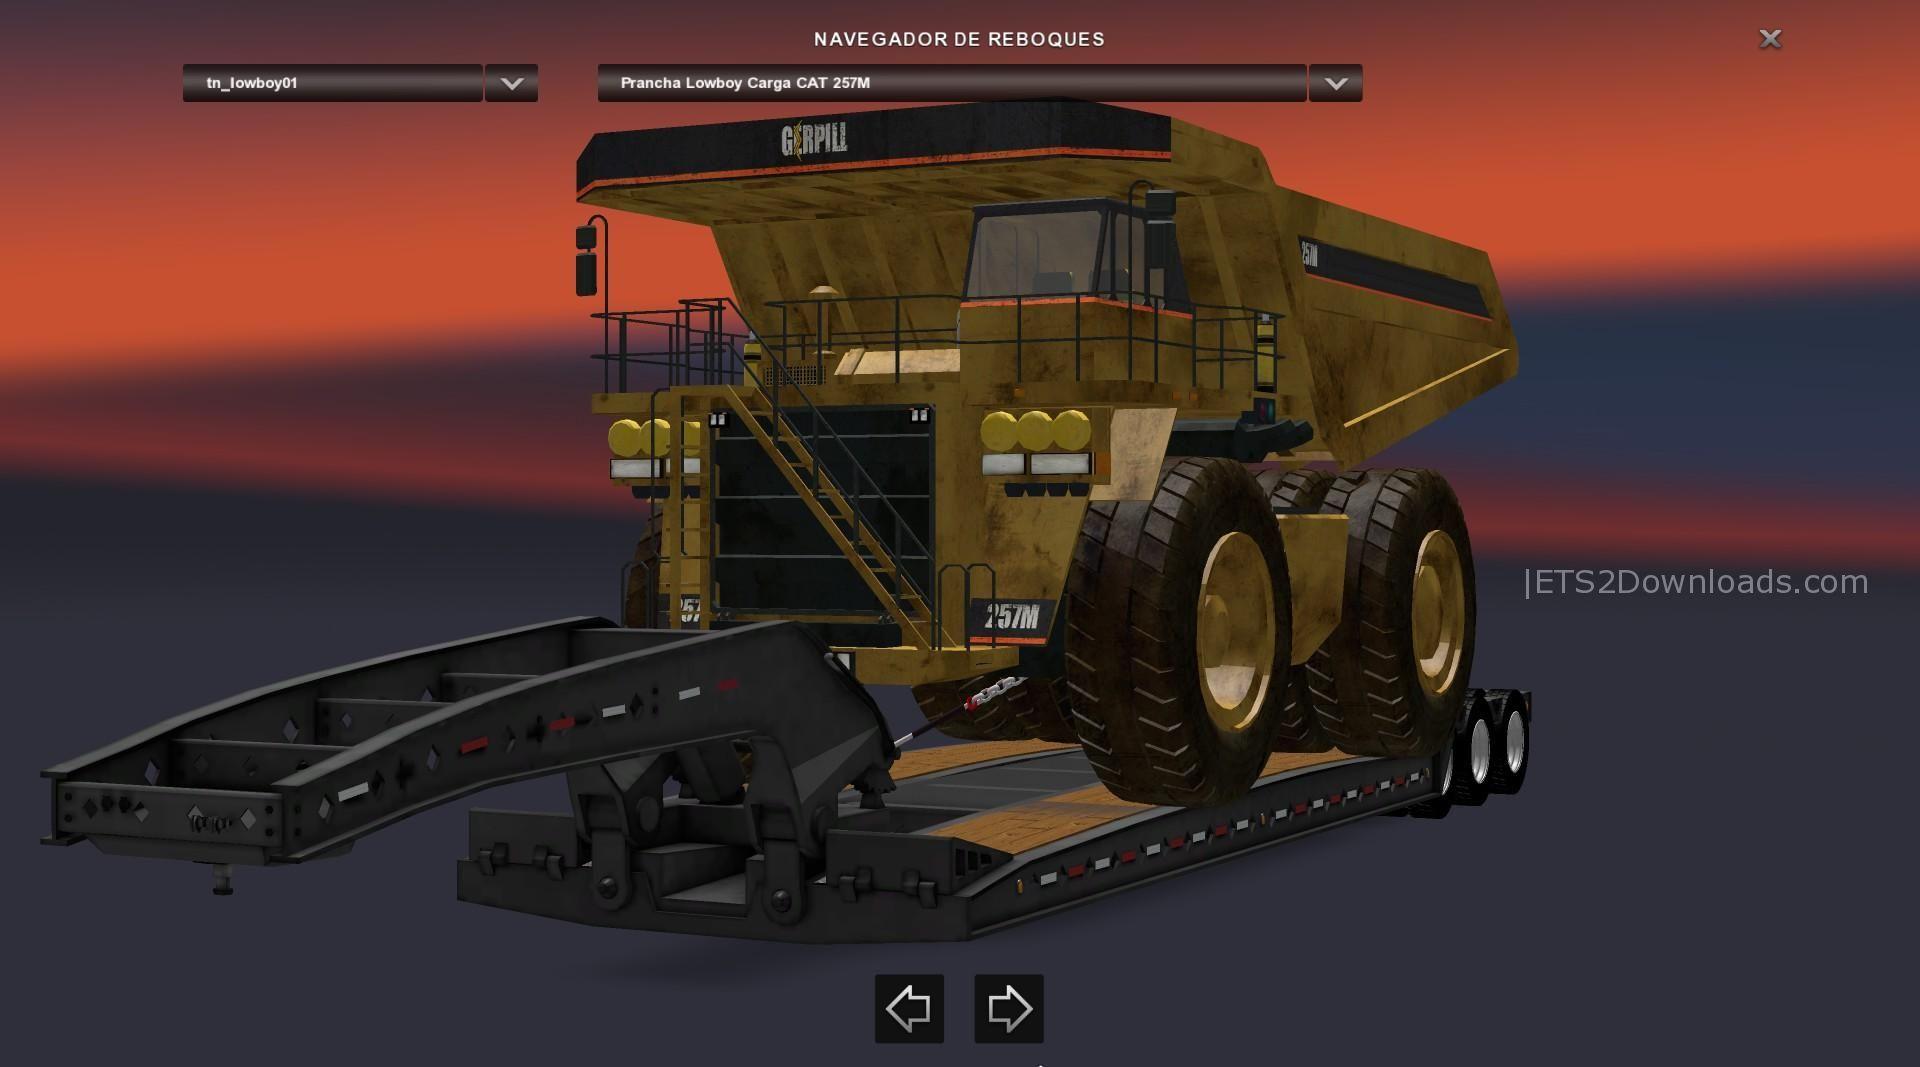 trailer-lowboy-cat-257m-1